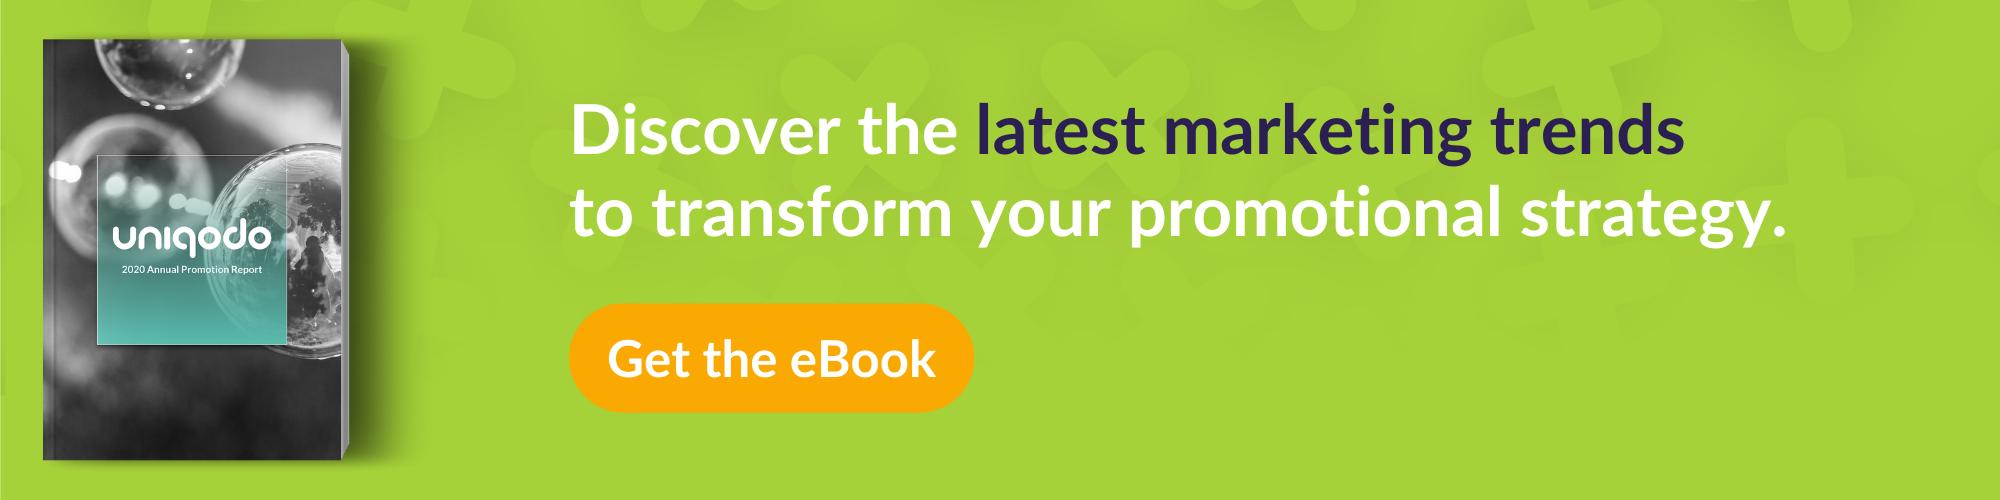 CTA promoting Annual report of consumer trends